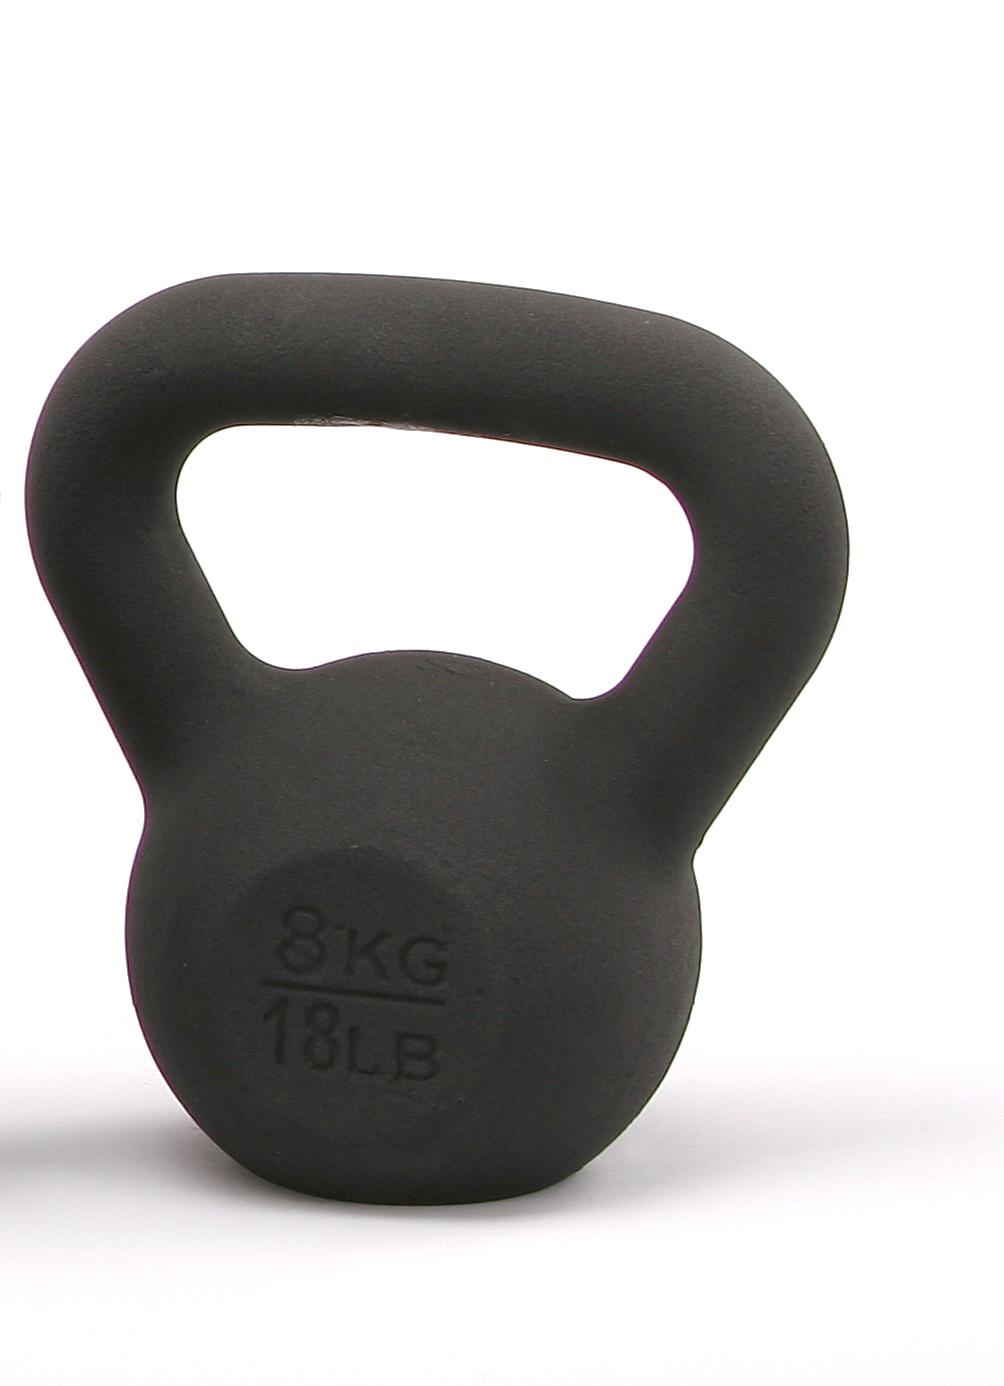 【Fitek 健身網】☆8公斤壺鈴☆8KG壺鈴 Cast Iron Kettlebell 鑄鐵壺鈴☆健身重量訓練/有氧運動/肌耐力訓練㊣台灣製